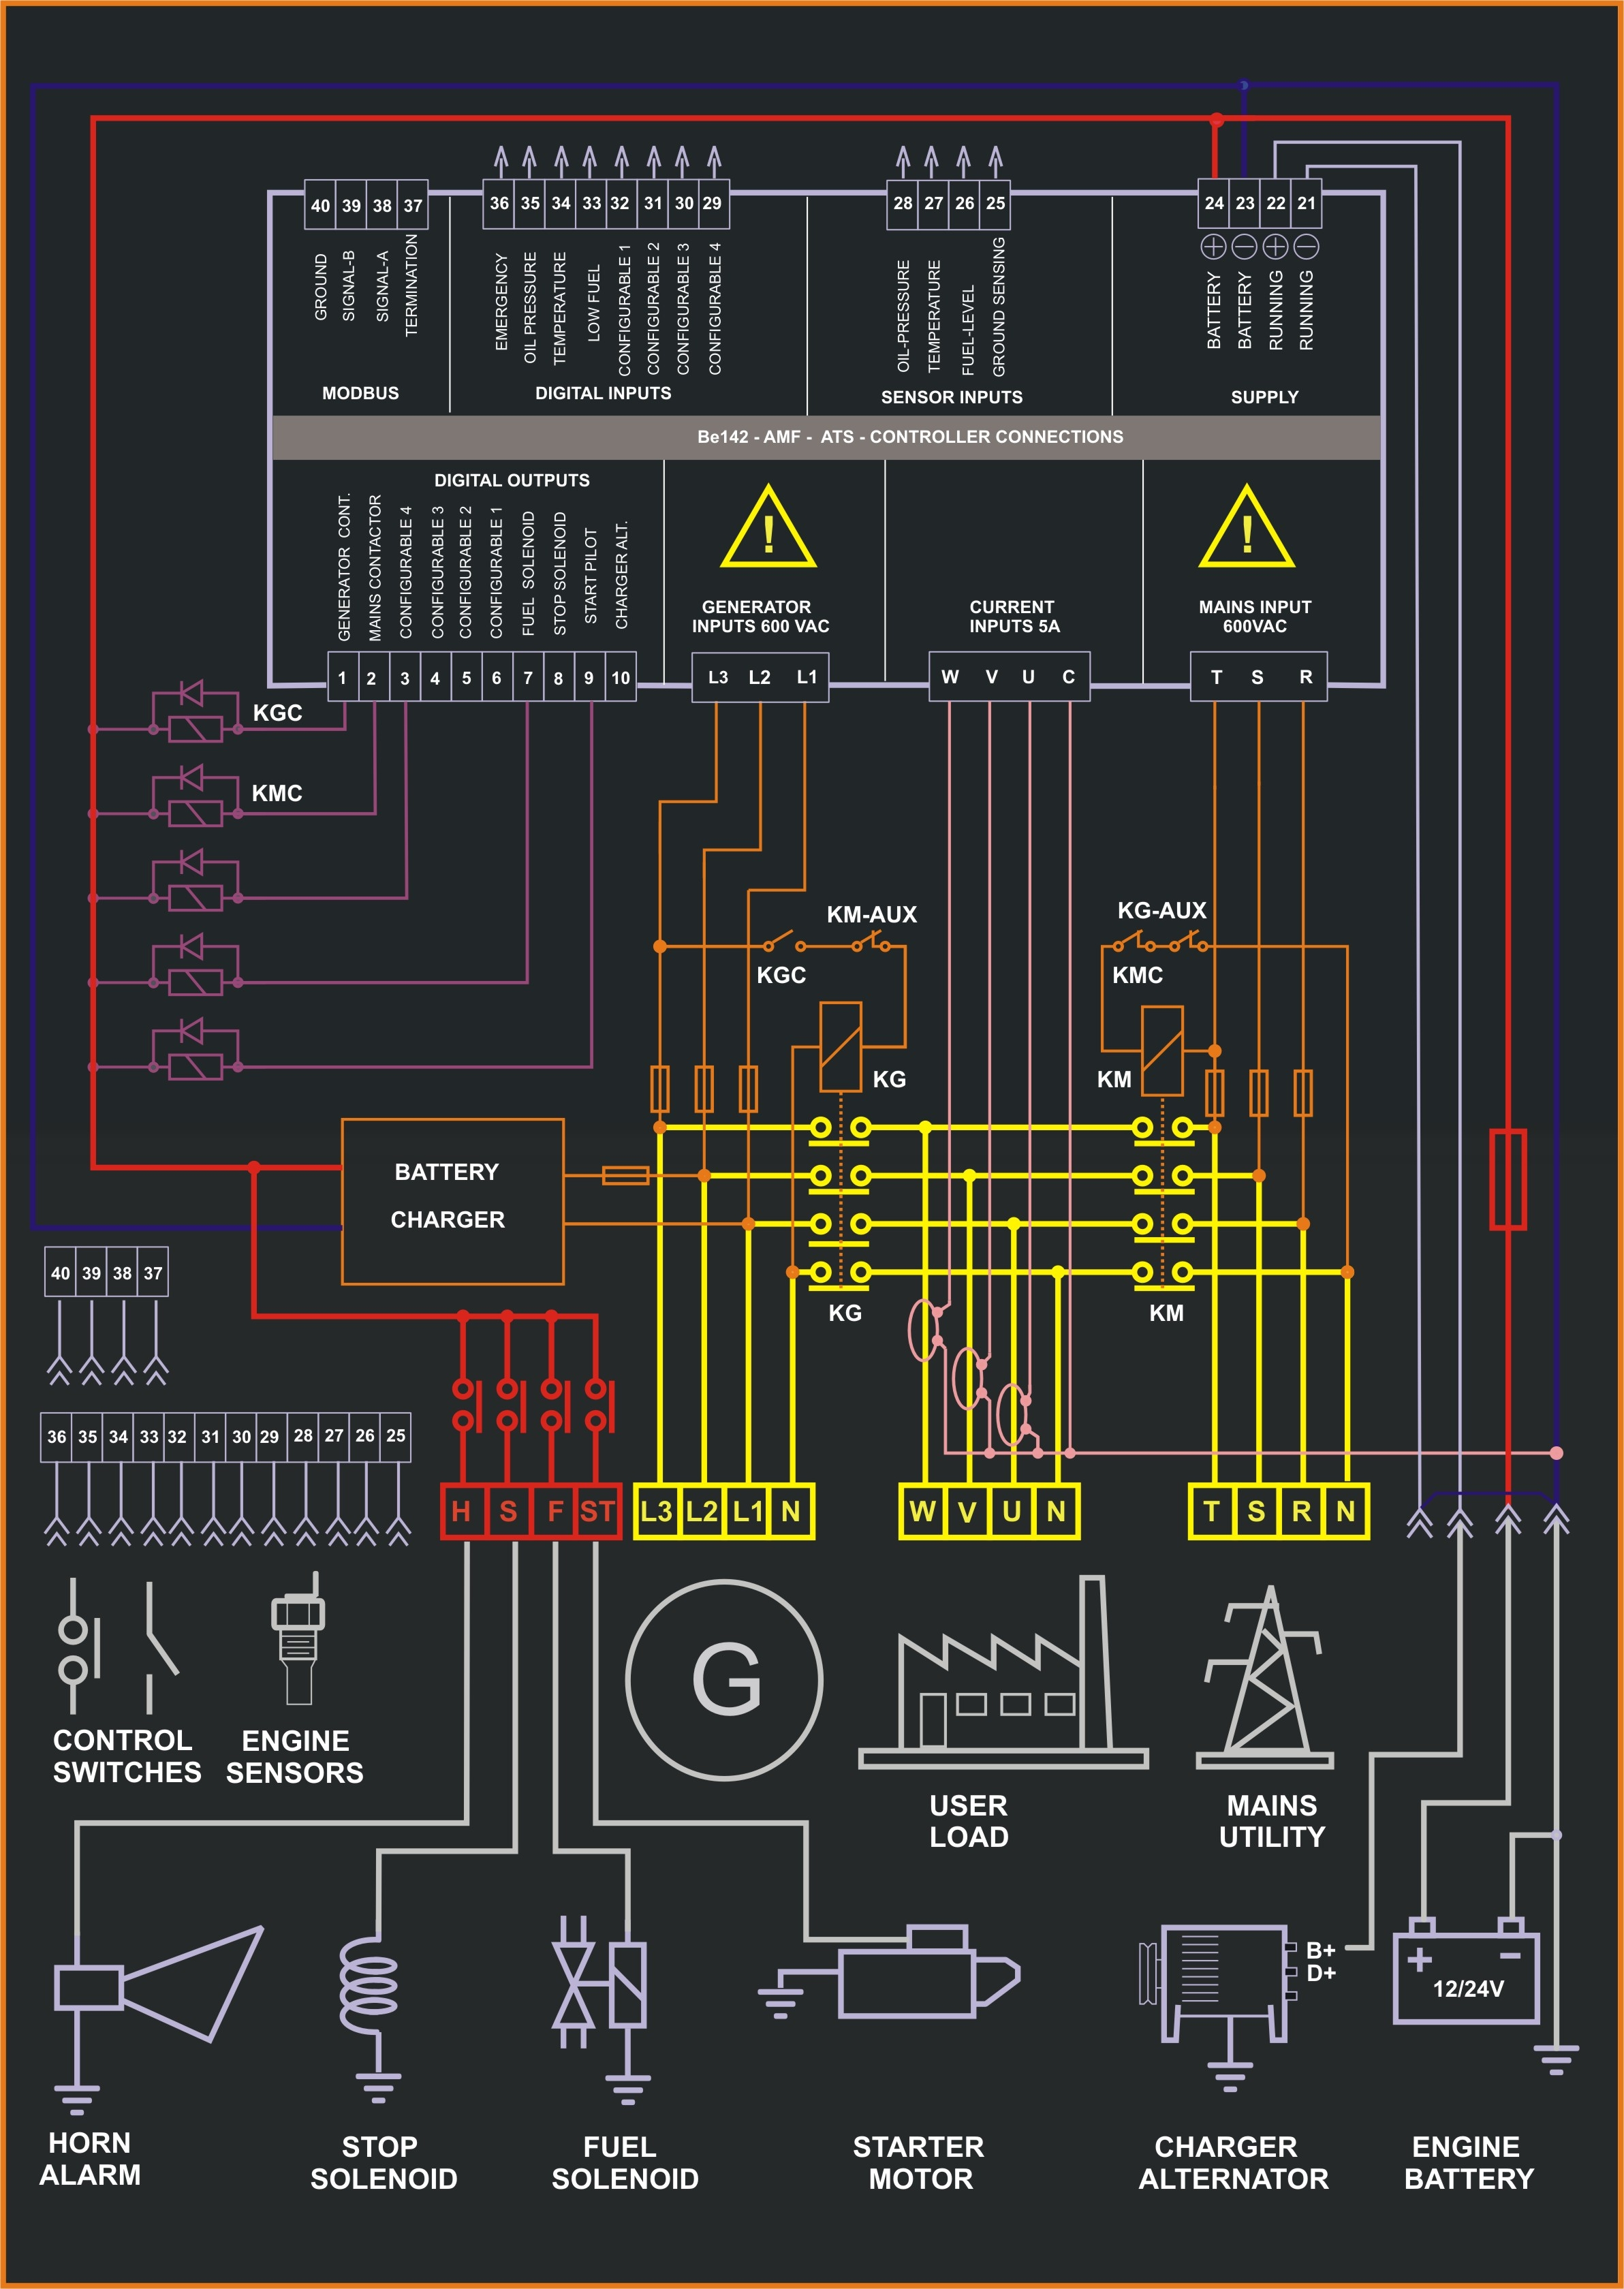 Control panel circuit diagram